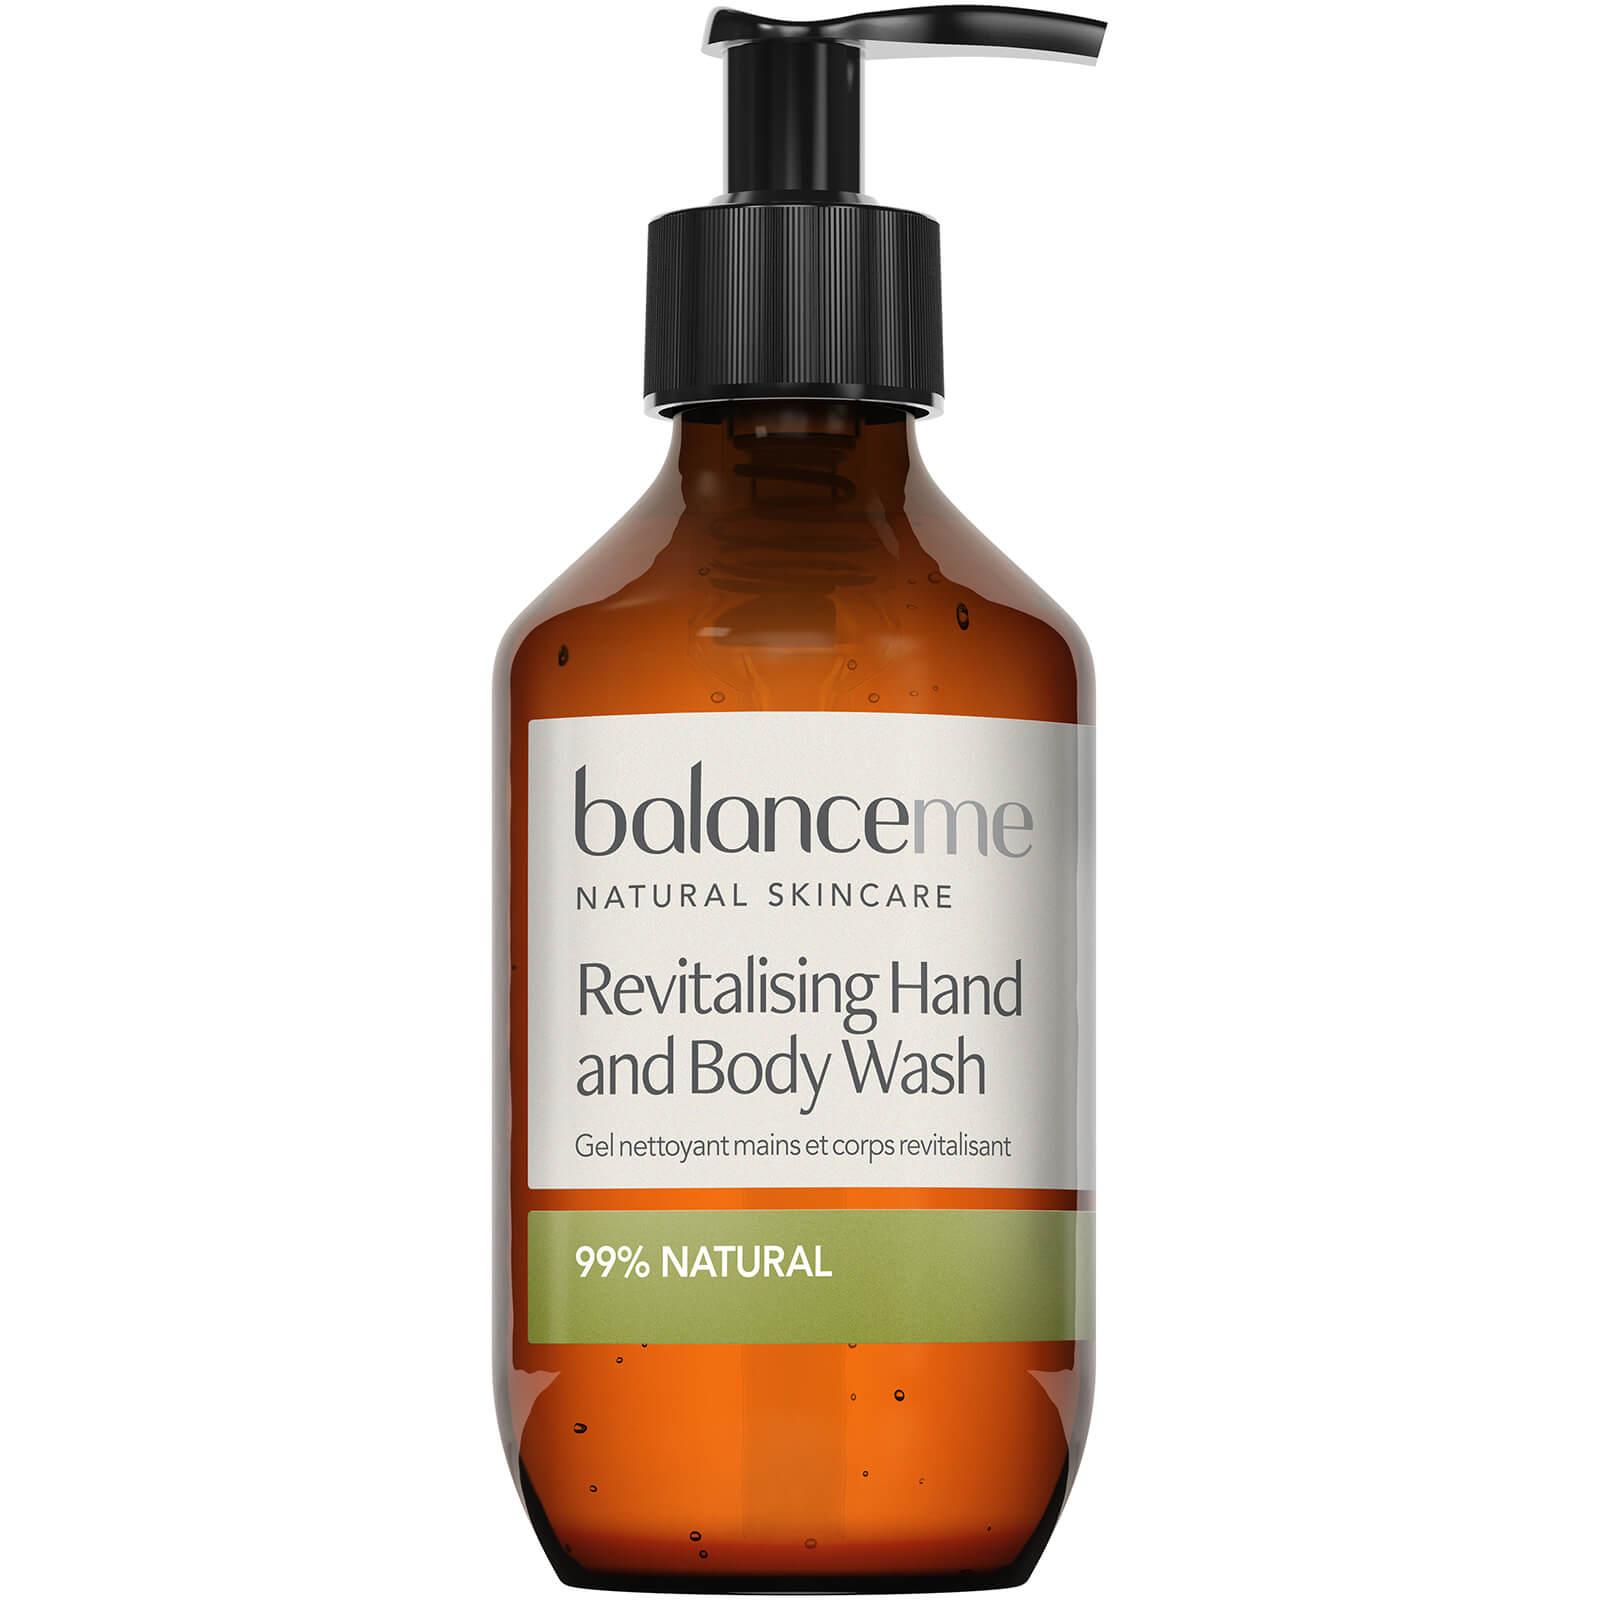 Balance Me Revitalising Hand and Body Wash 280ml